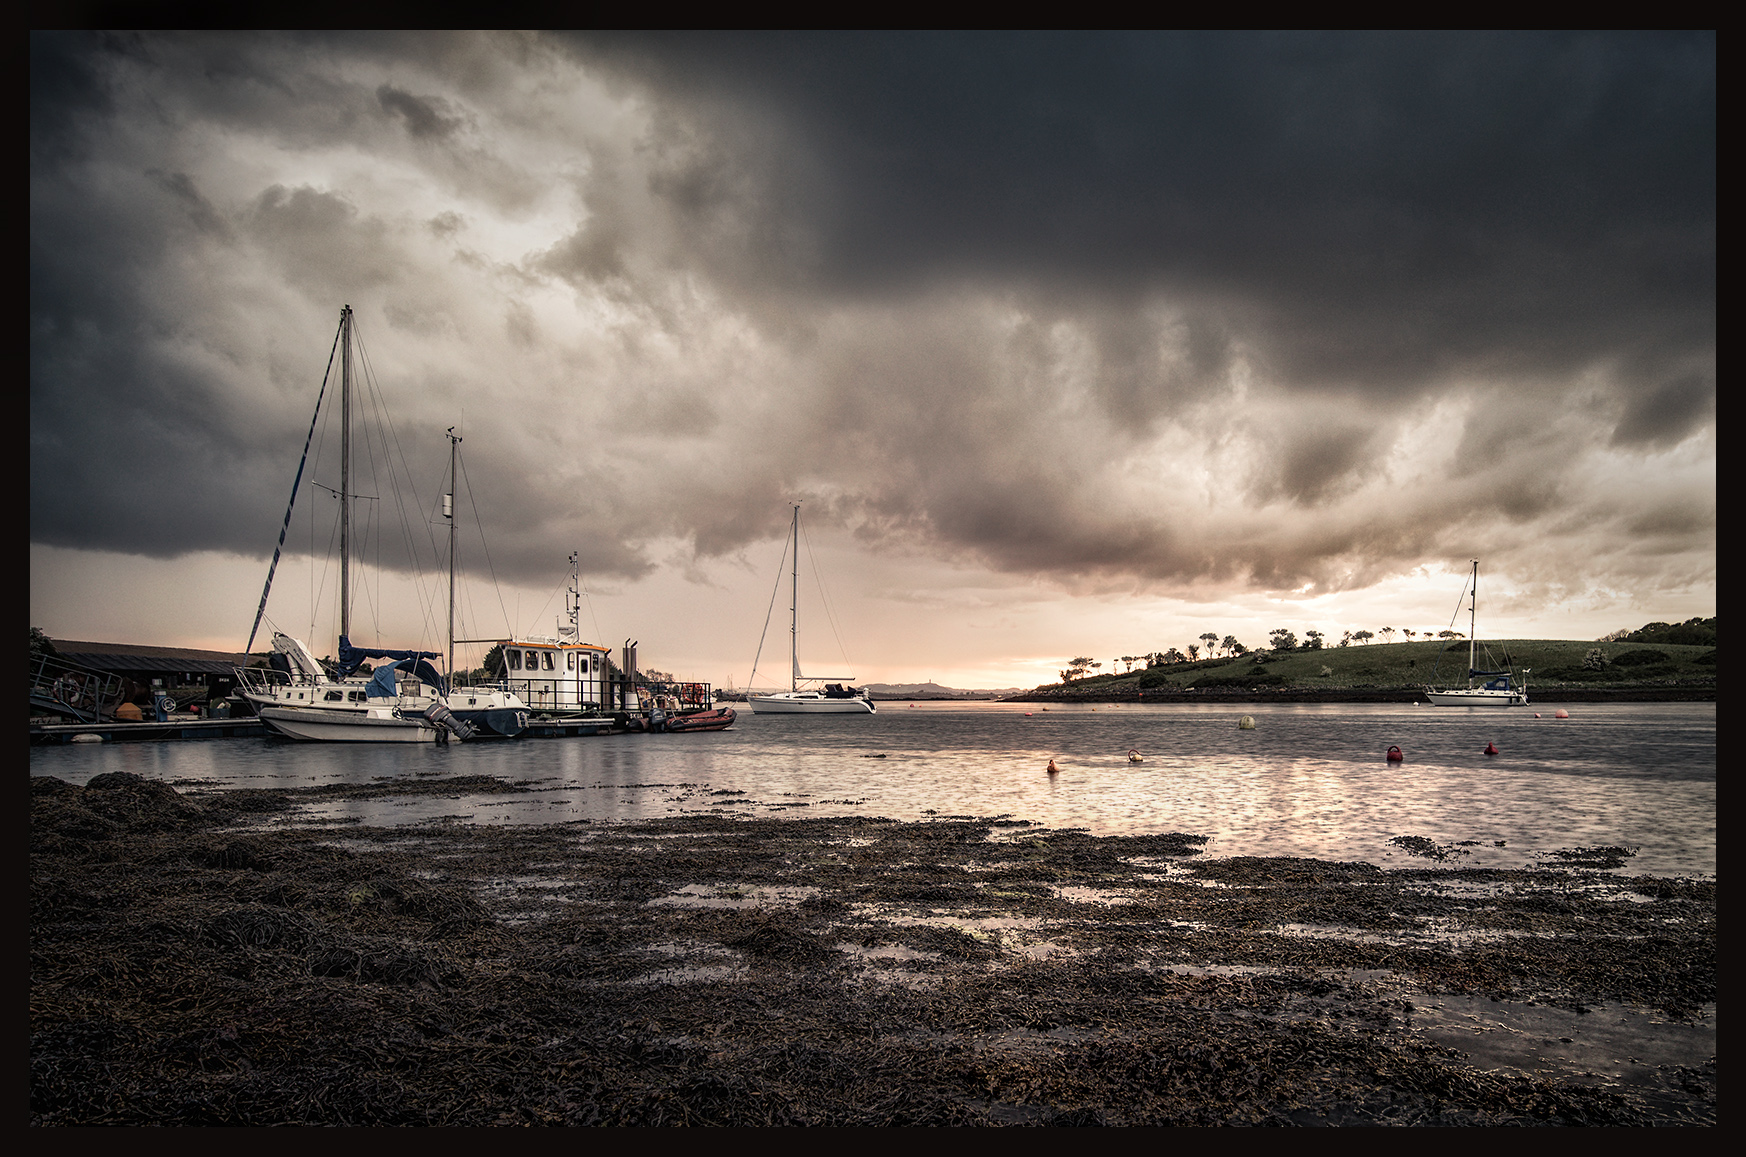 Moored Boats - Sketrick Island